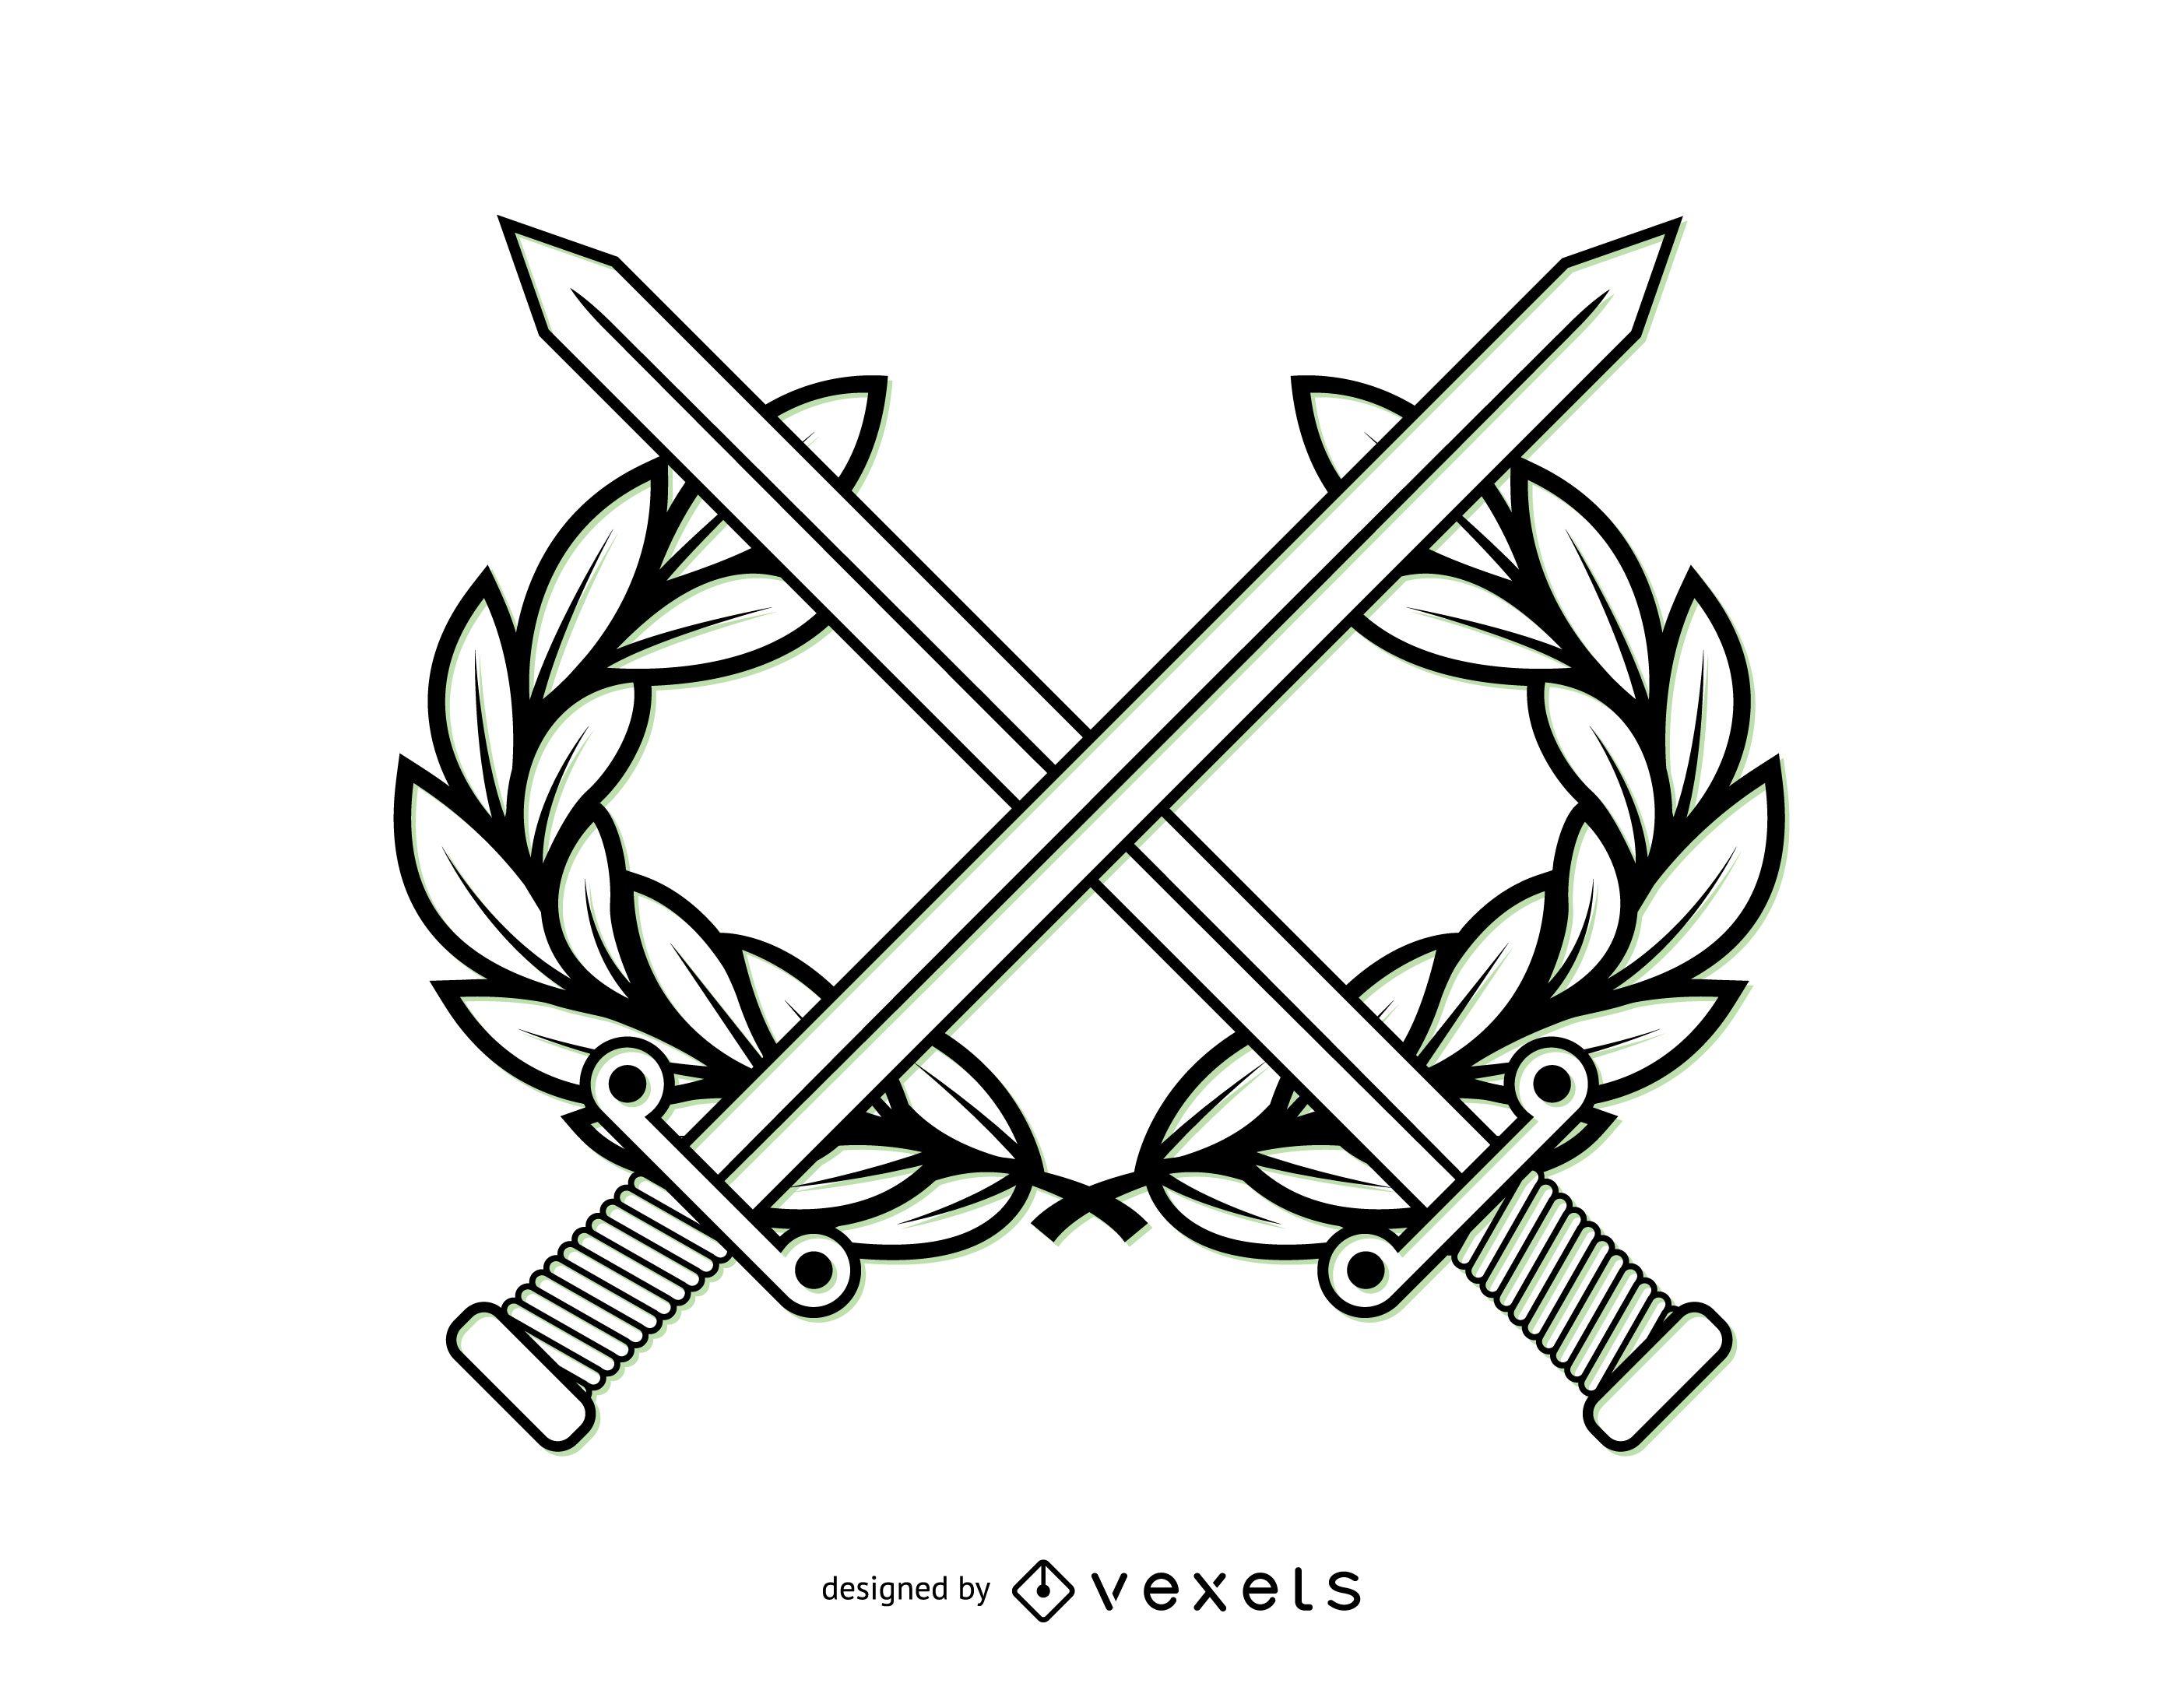 Escudo de armas militar de arte lineal